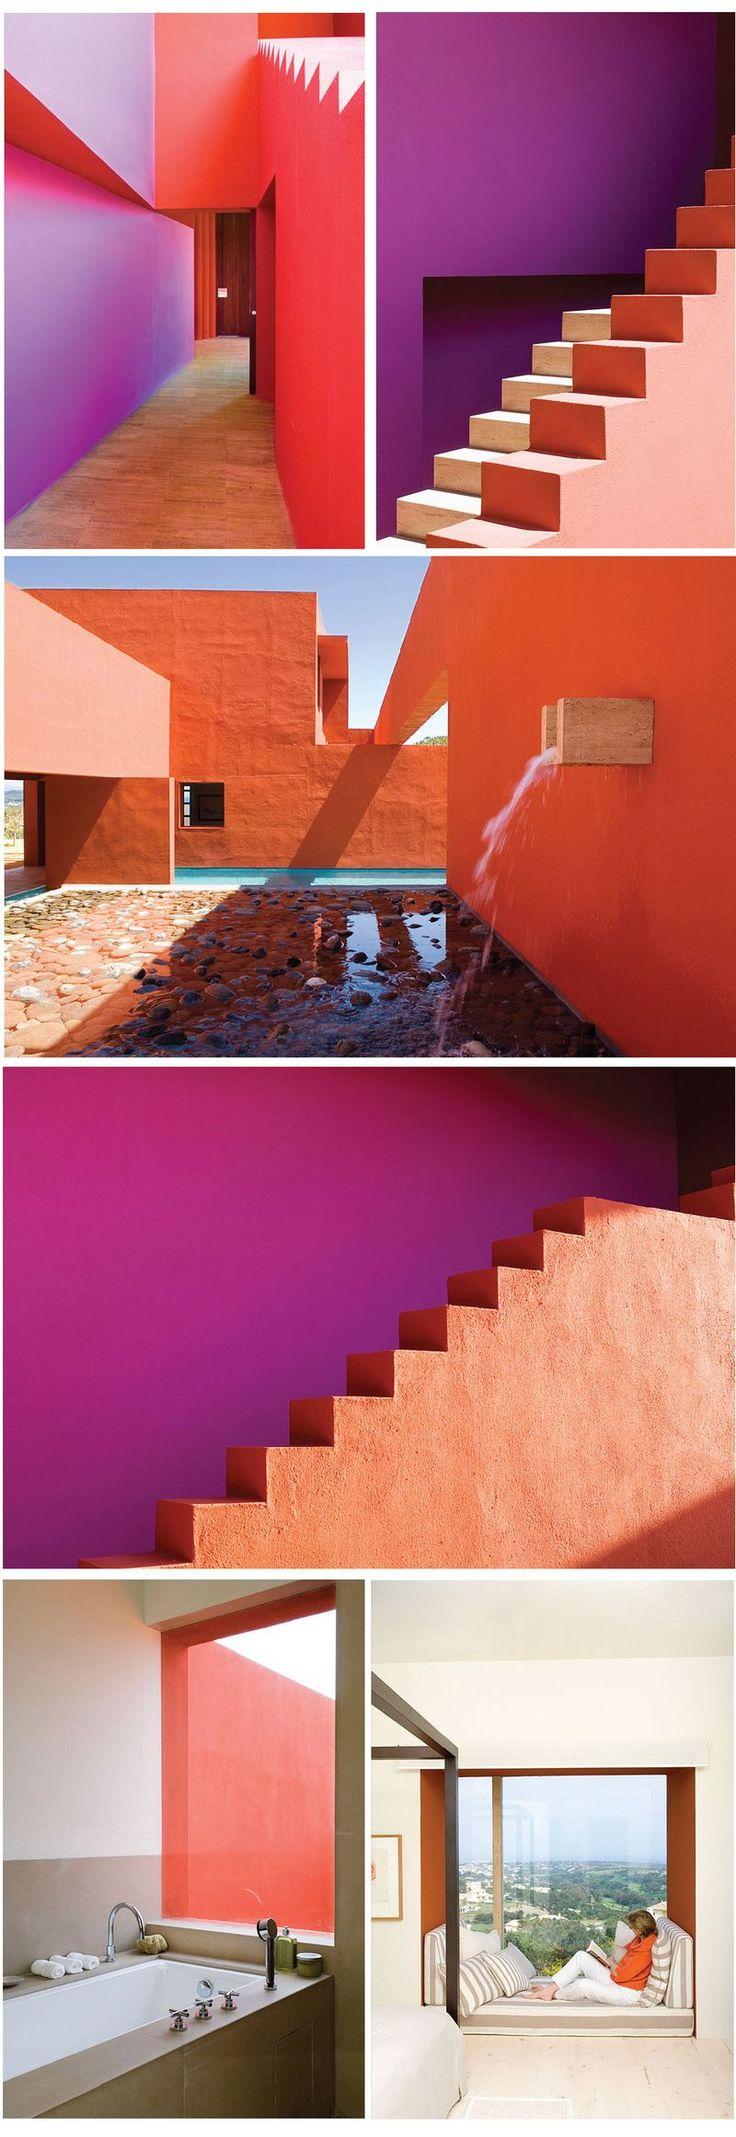 Mexican architecture . Ricardo Legorreta